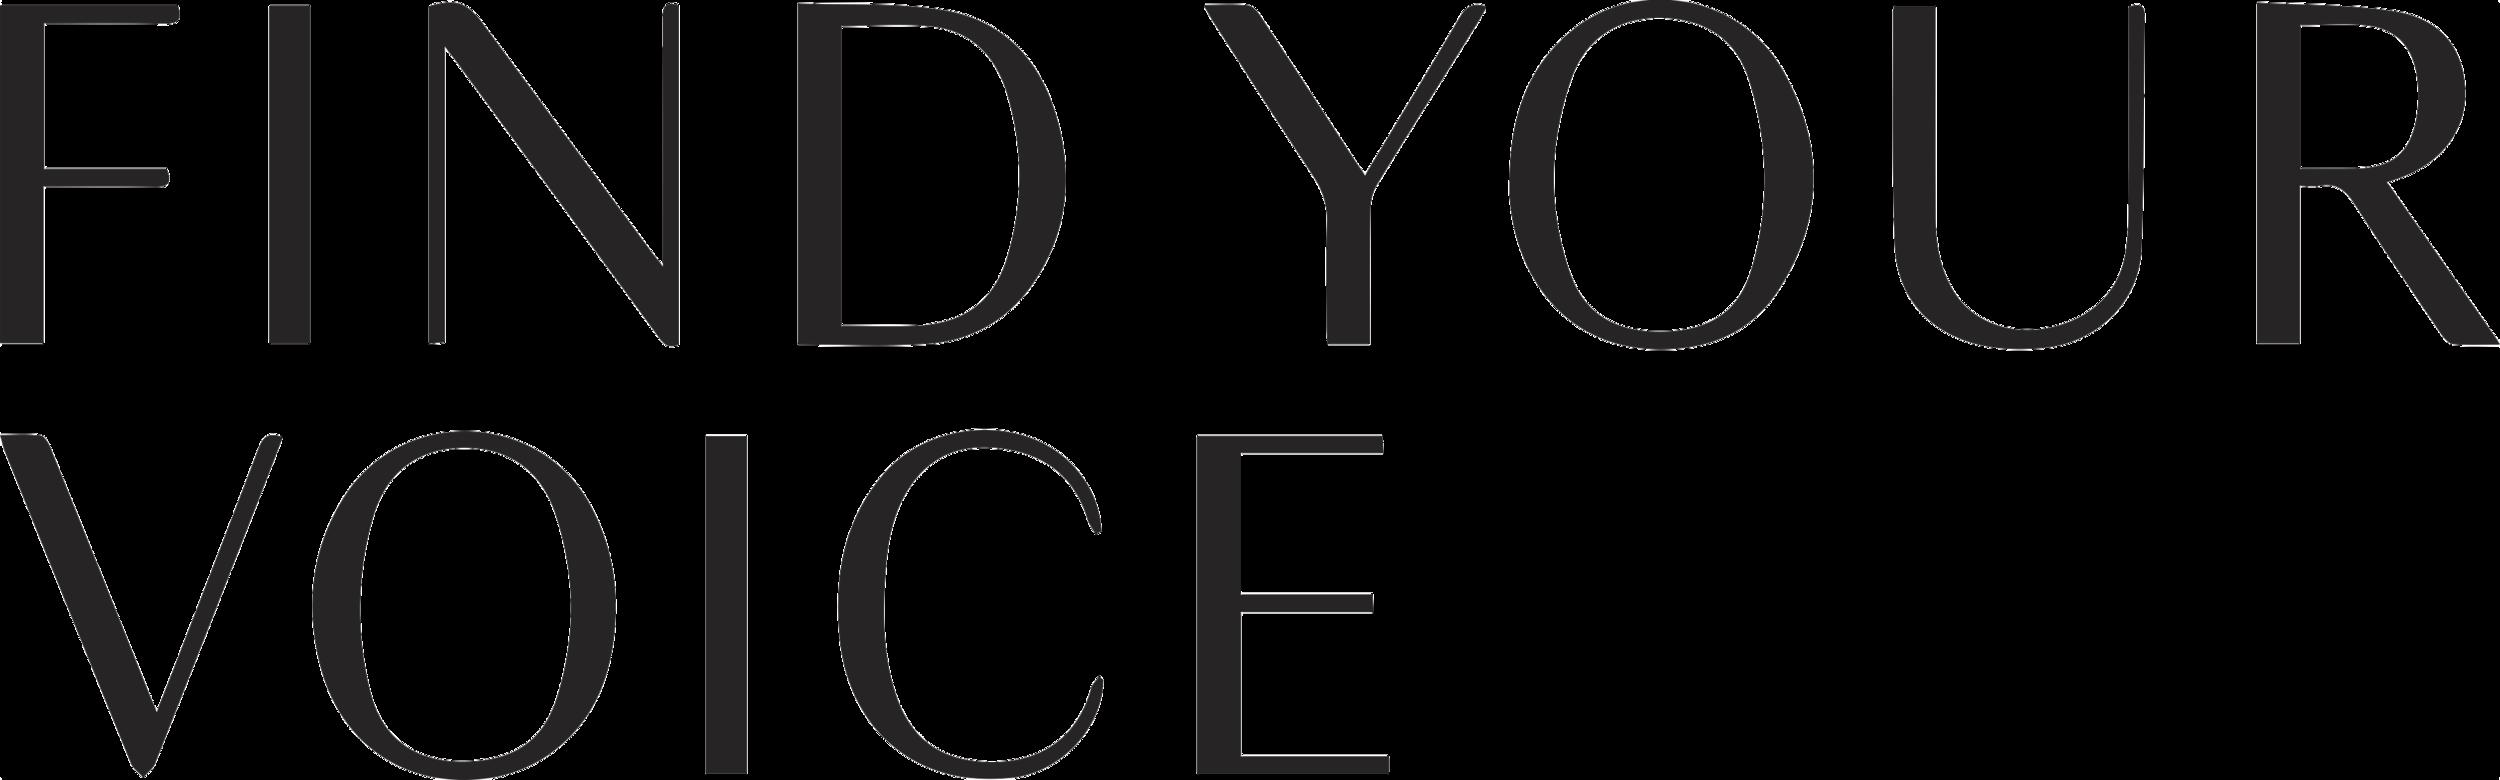 FindYourvoice_01 Primary Logo - black_transparent.PNG